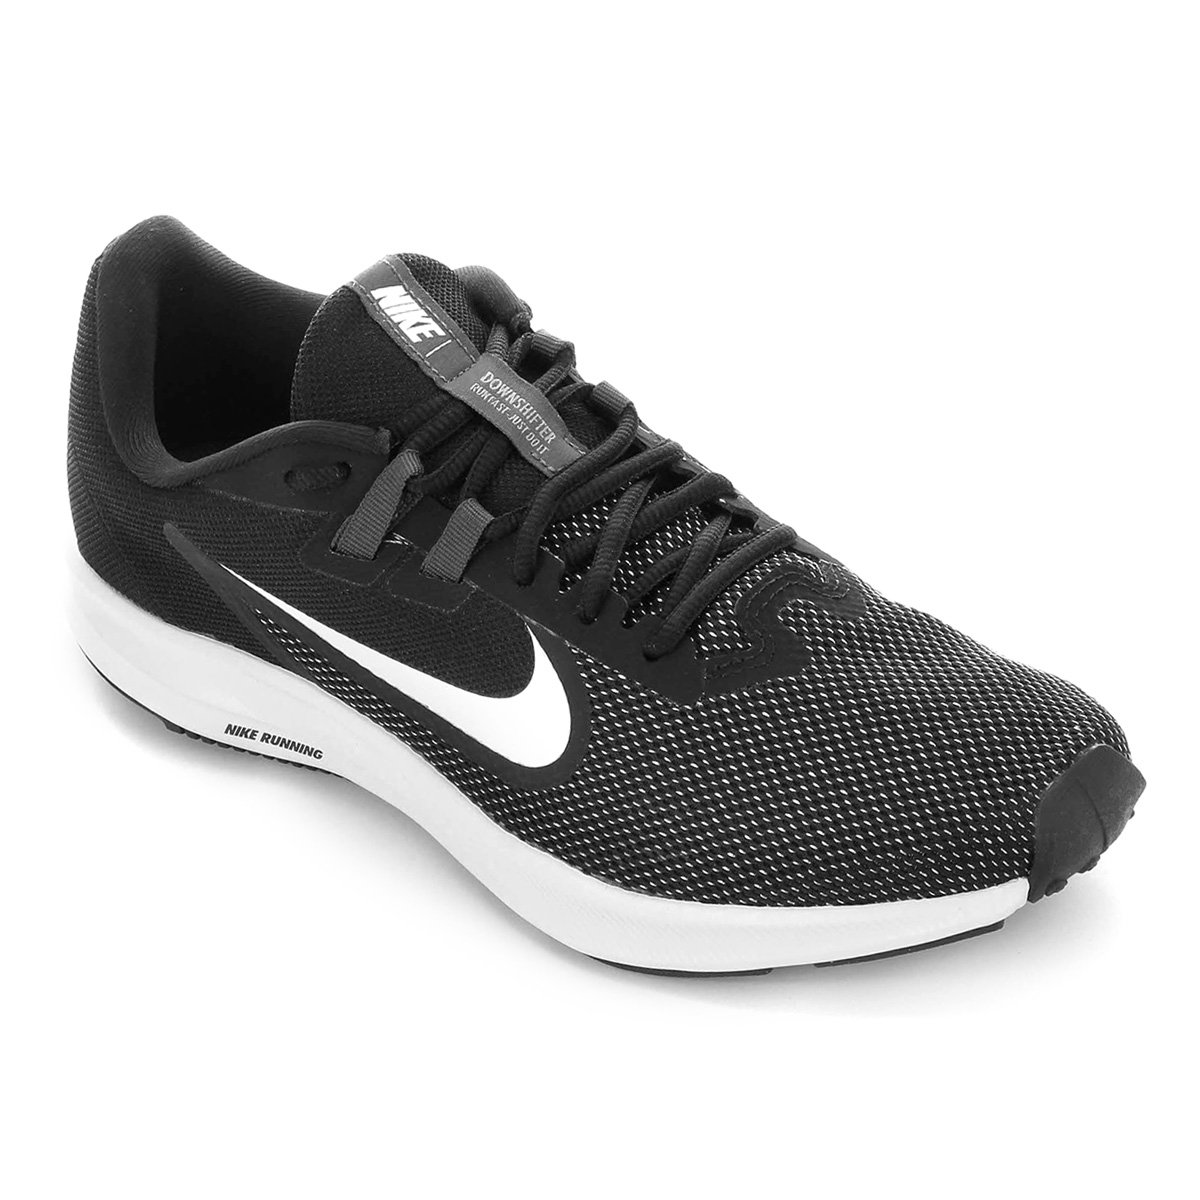 c2153a7665be1 Tênis Nike Downshifter 9 Masculino - Preto e Branco | Netshoes